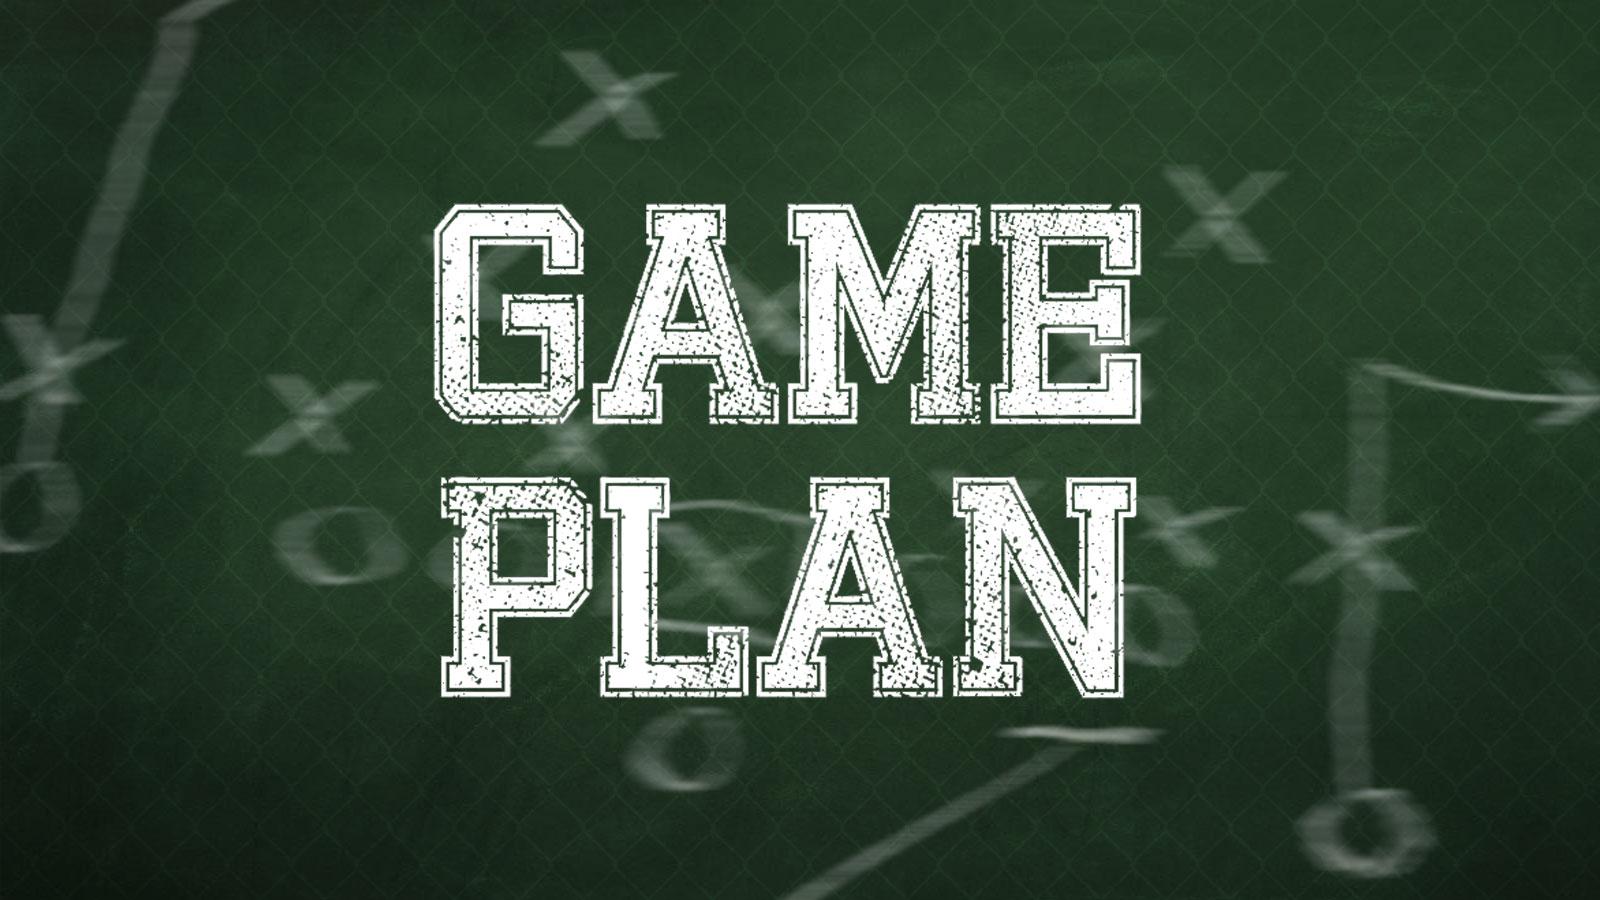 Game Plan Diagram - Strong Automotive Merchandising